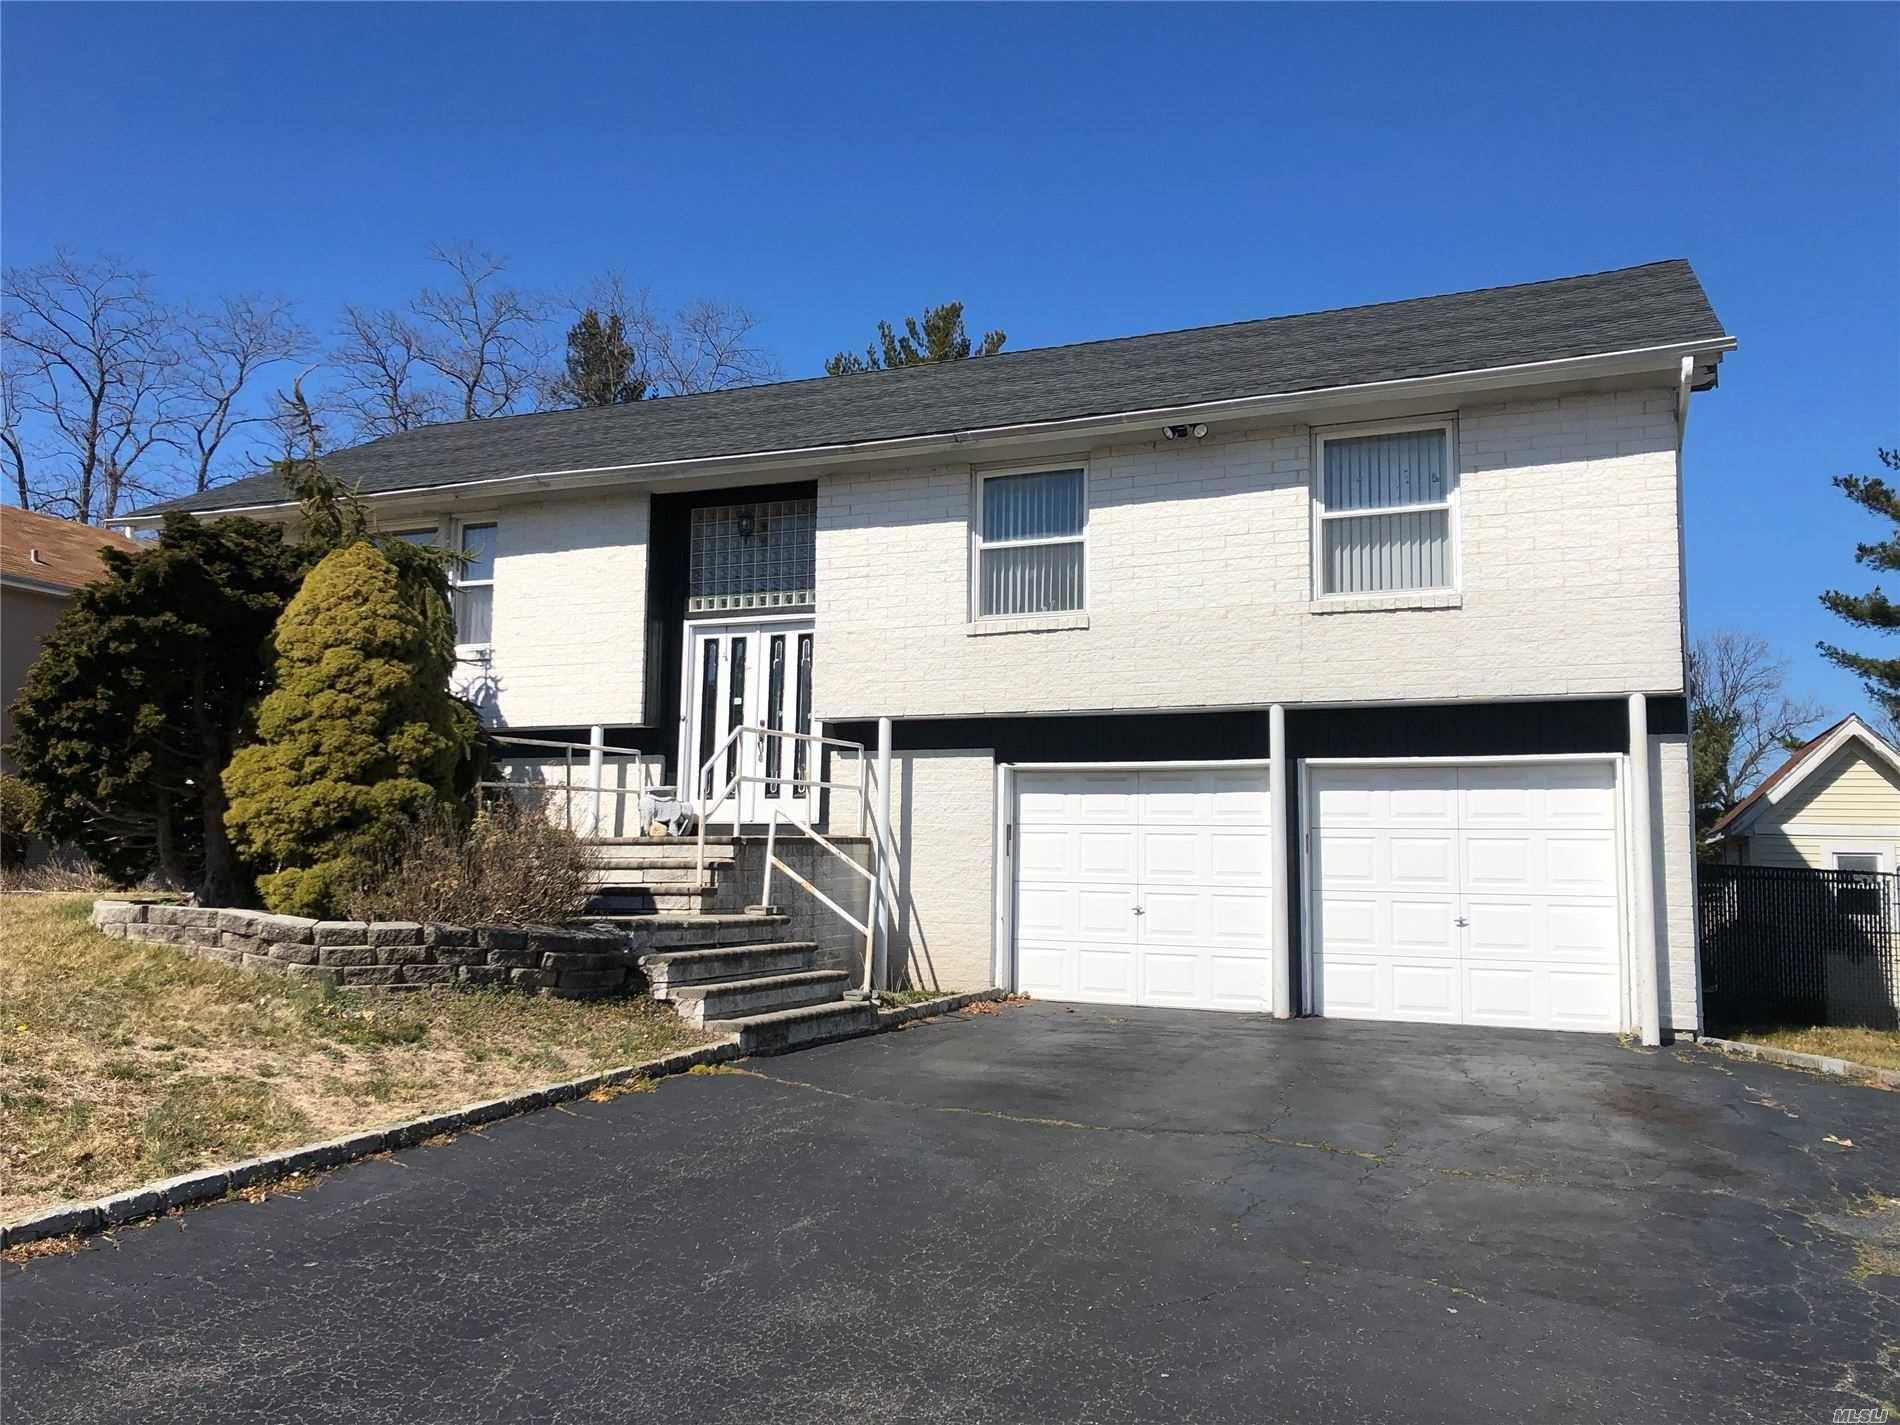 9 Bridle Lane, Glen Cove, NY 11542 - MLS#: 3232932